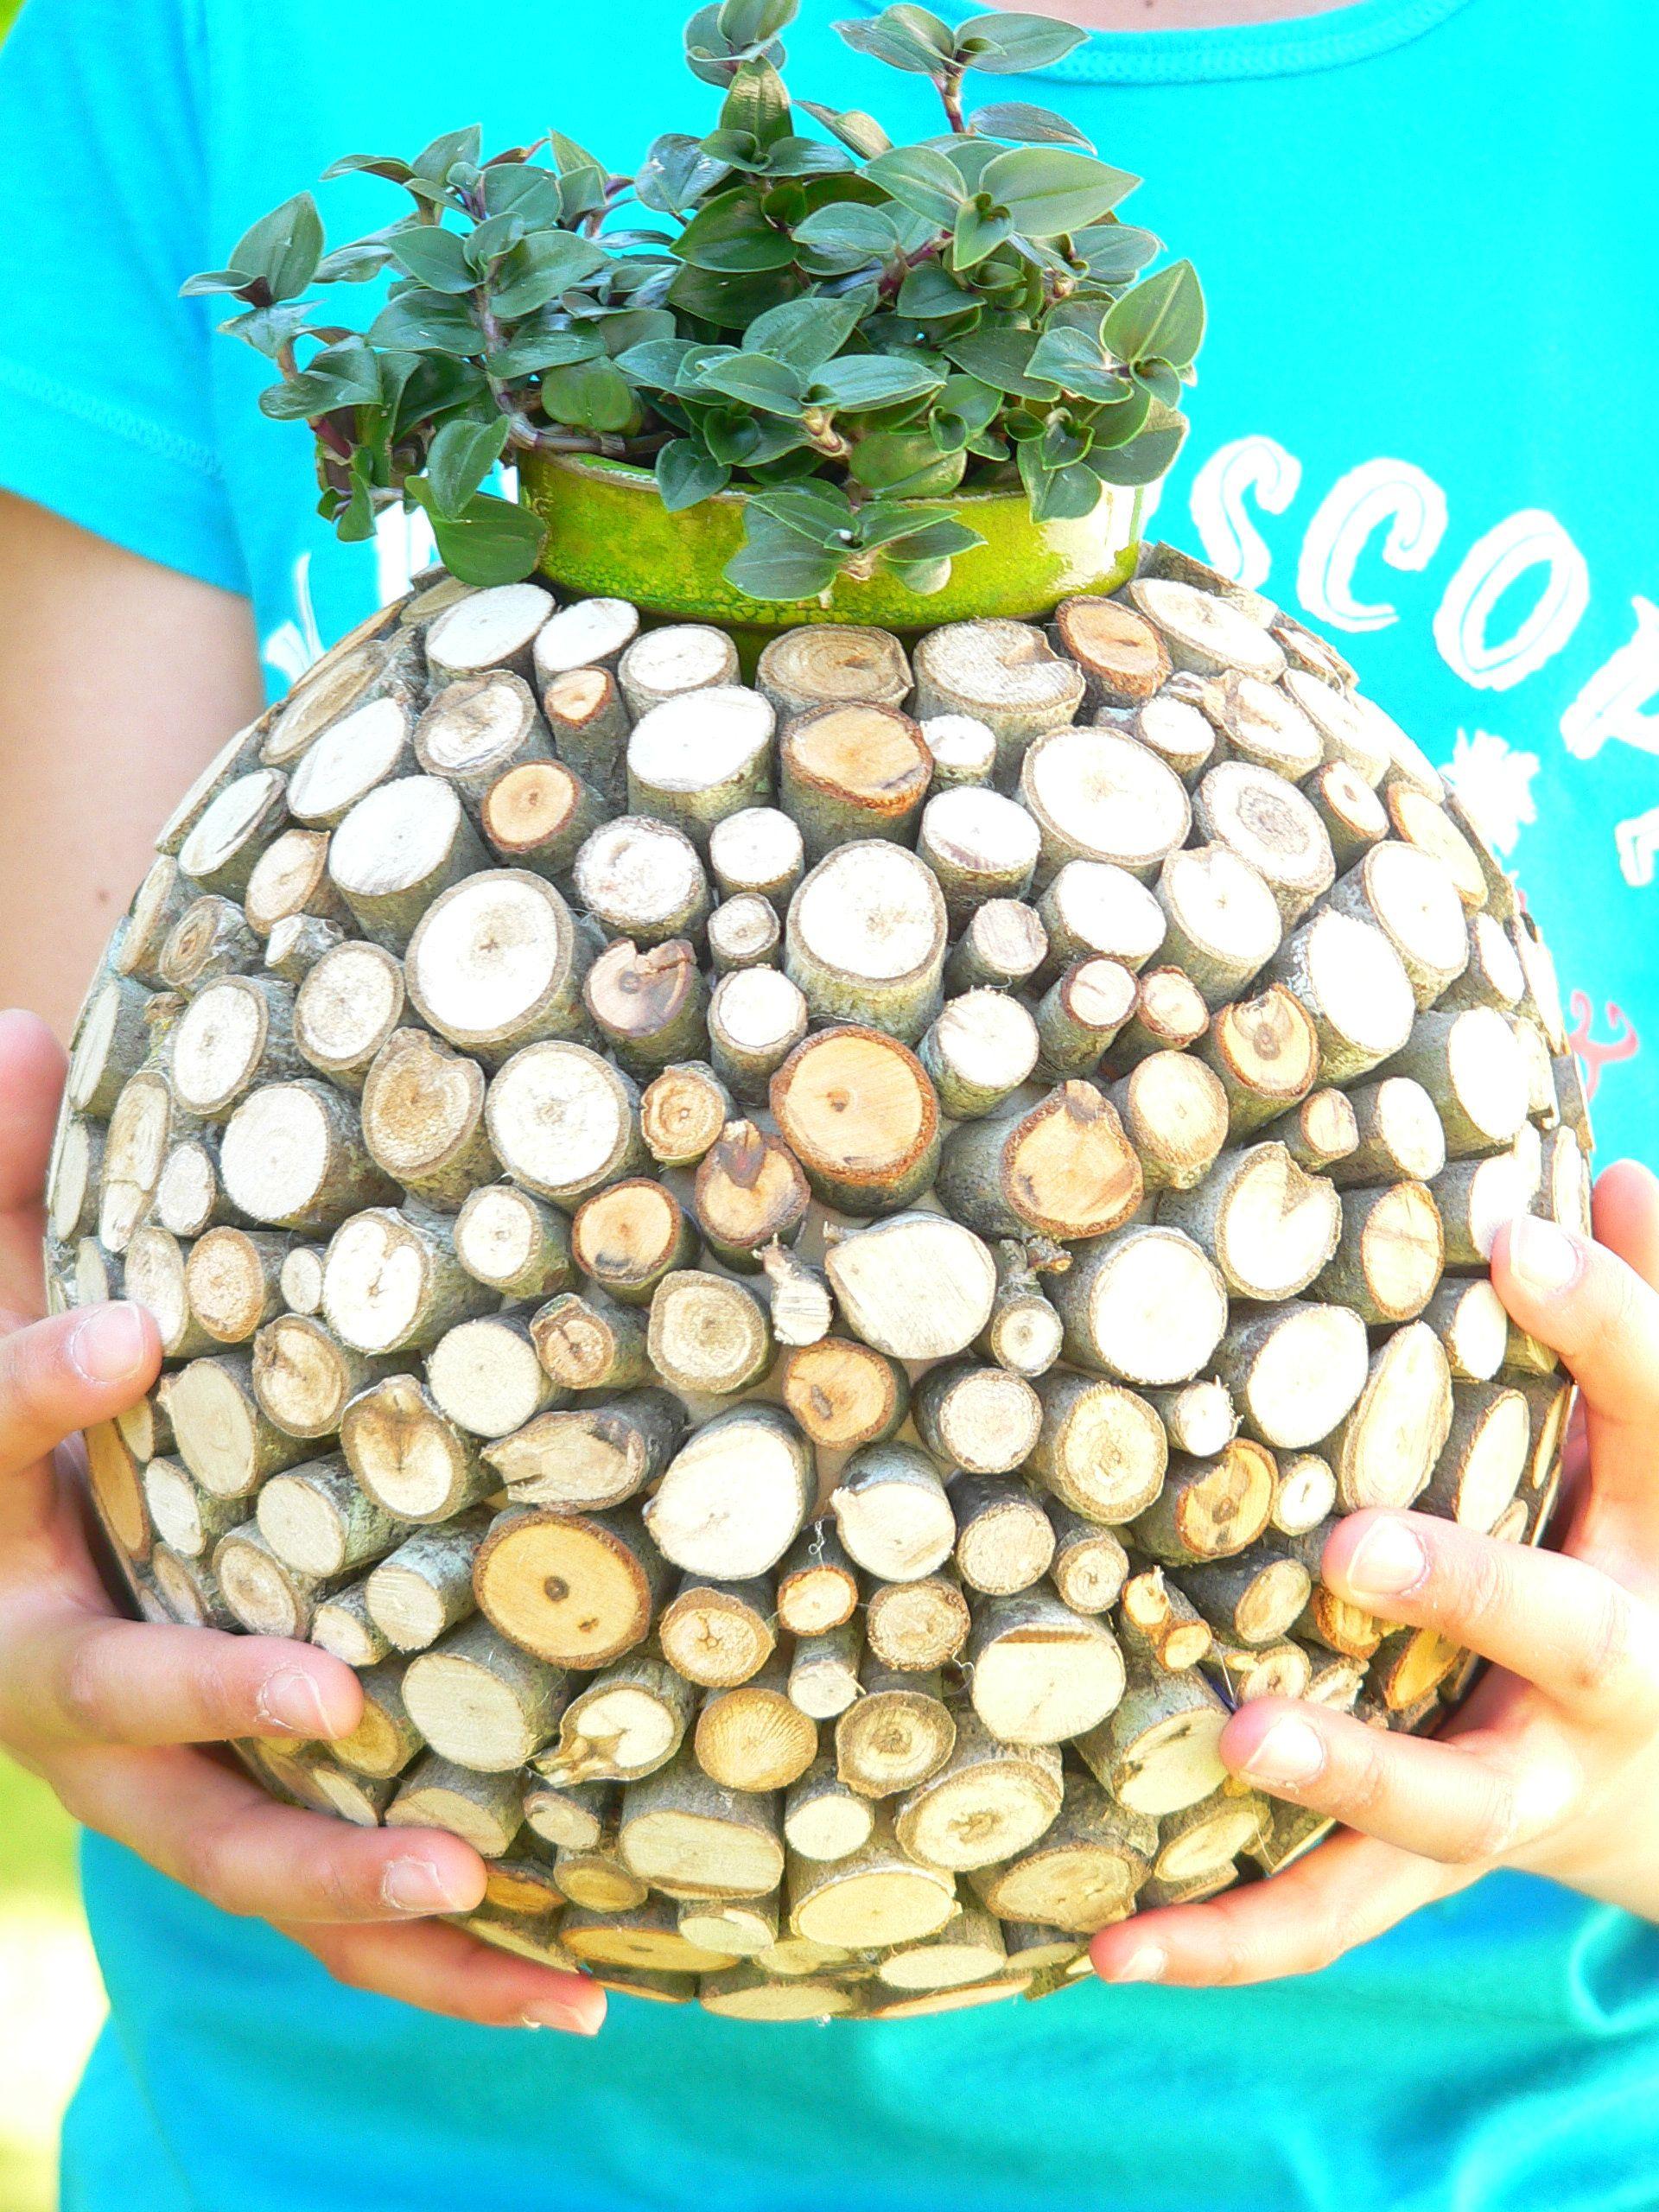 Wood Slice Planter For Succulentes Mini Plant Wooden Vase Rustic